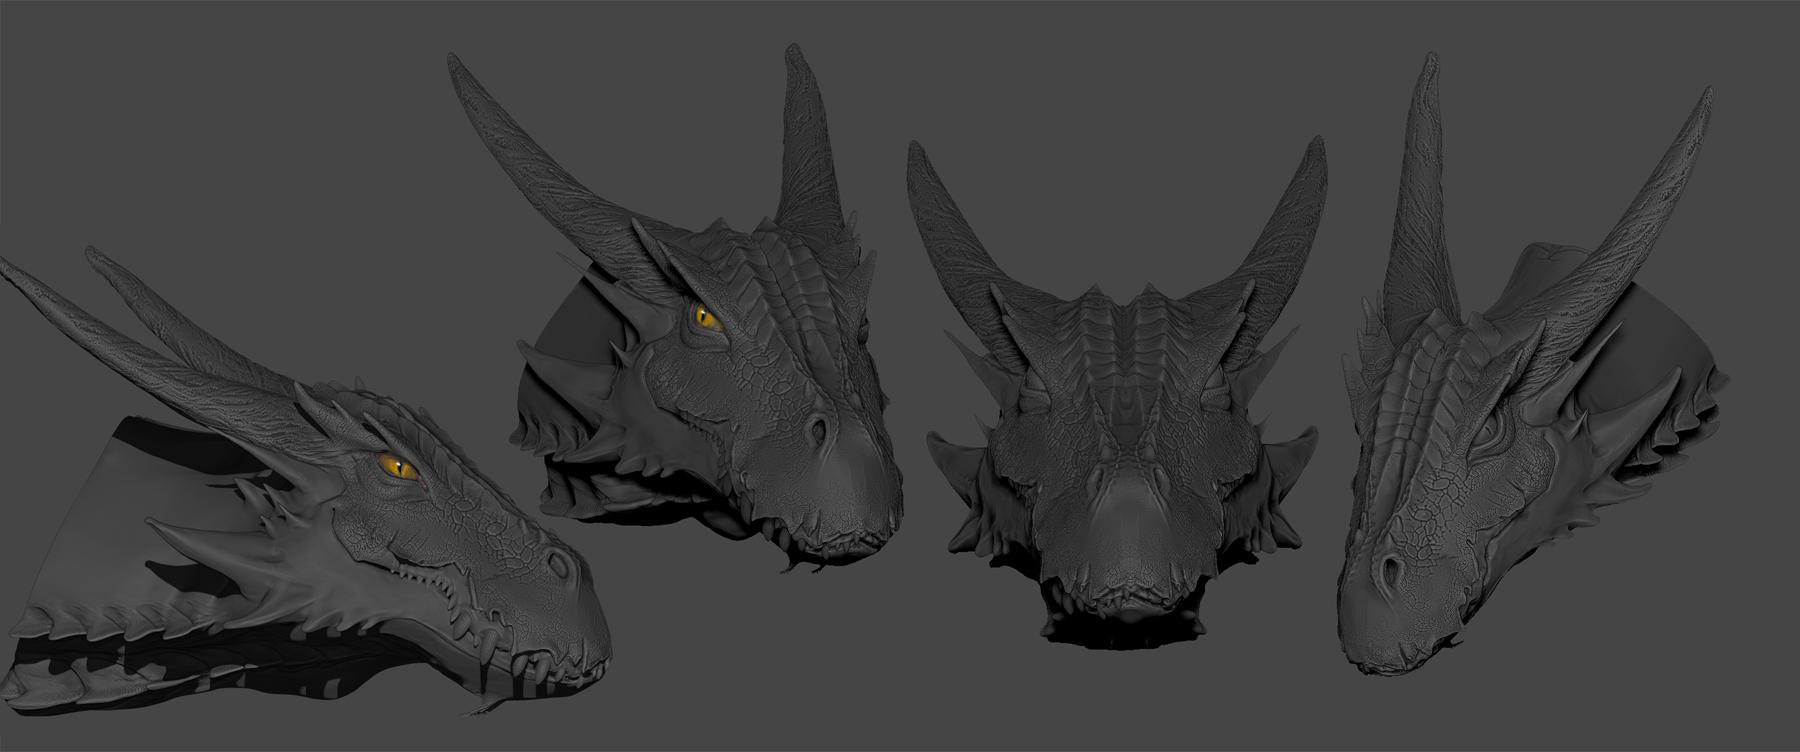 dragonA.jpg